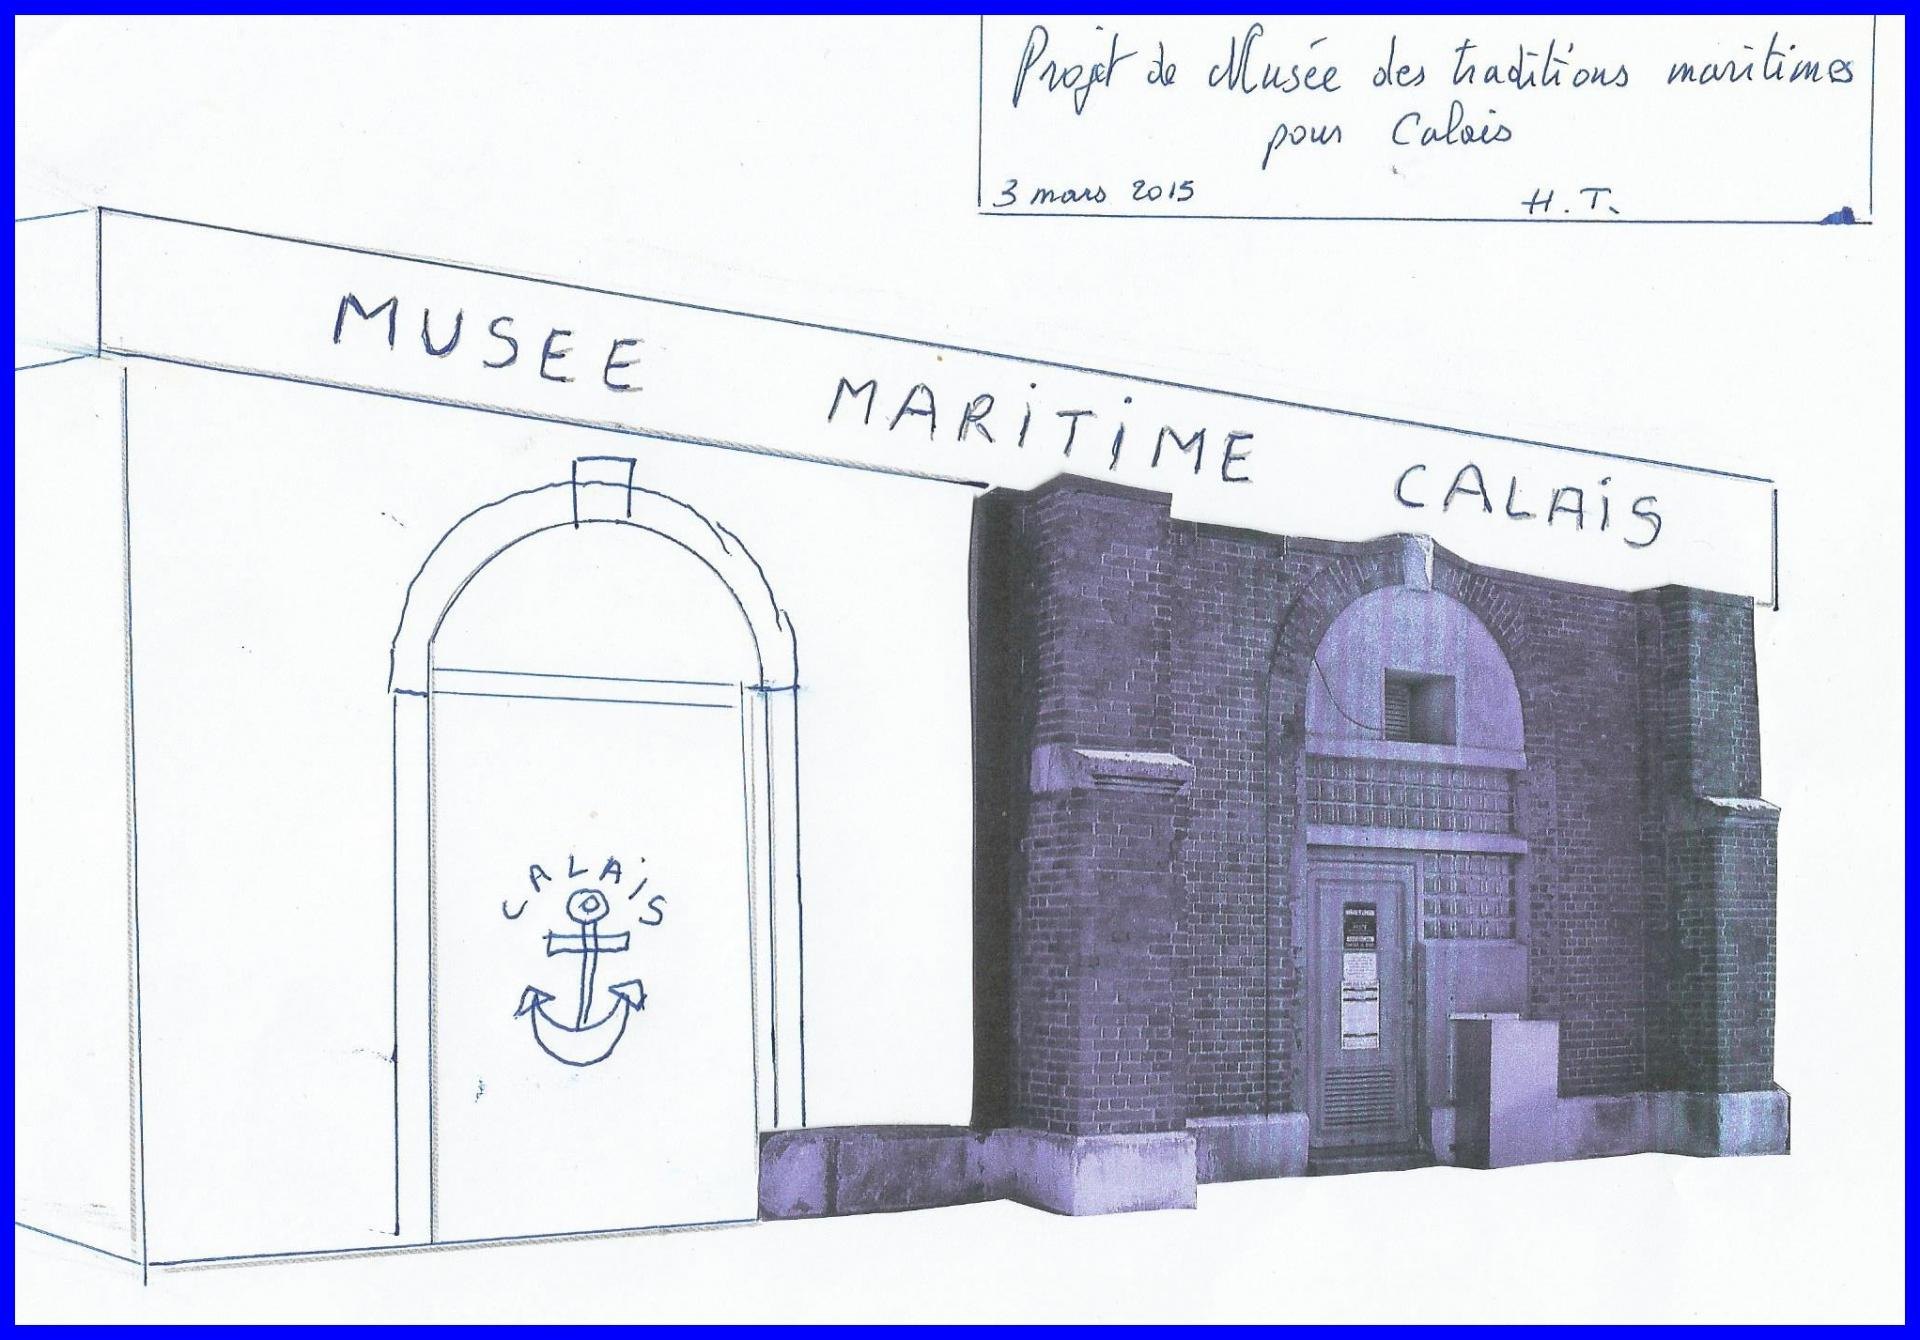 Calais projet musee maritime encadre